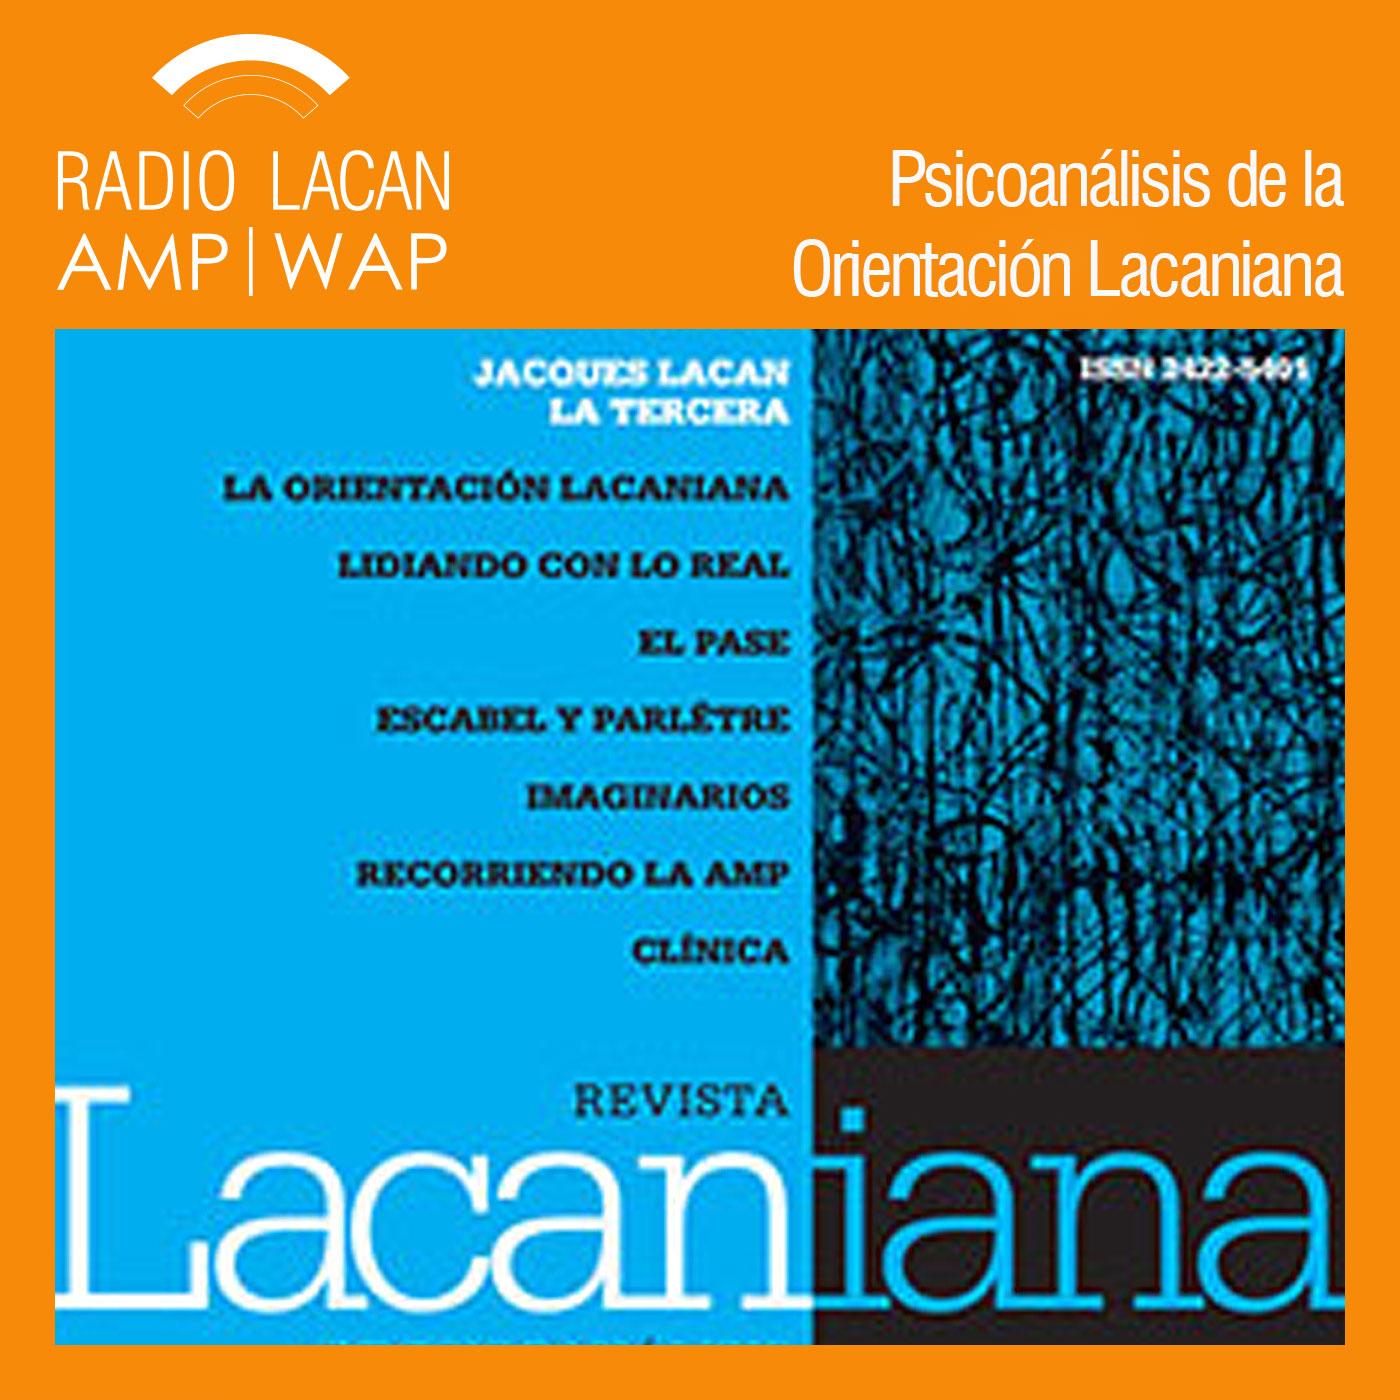 RadioLacan.com | <![CDATA[Coloquio Seminario sobre La Tercera de Jacques Lacan en la EOL]]>